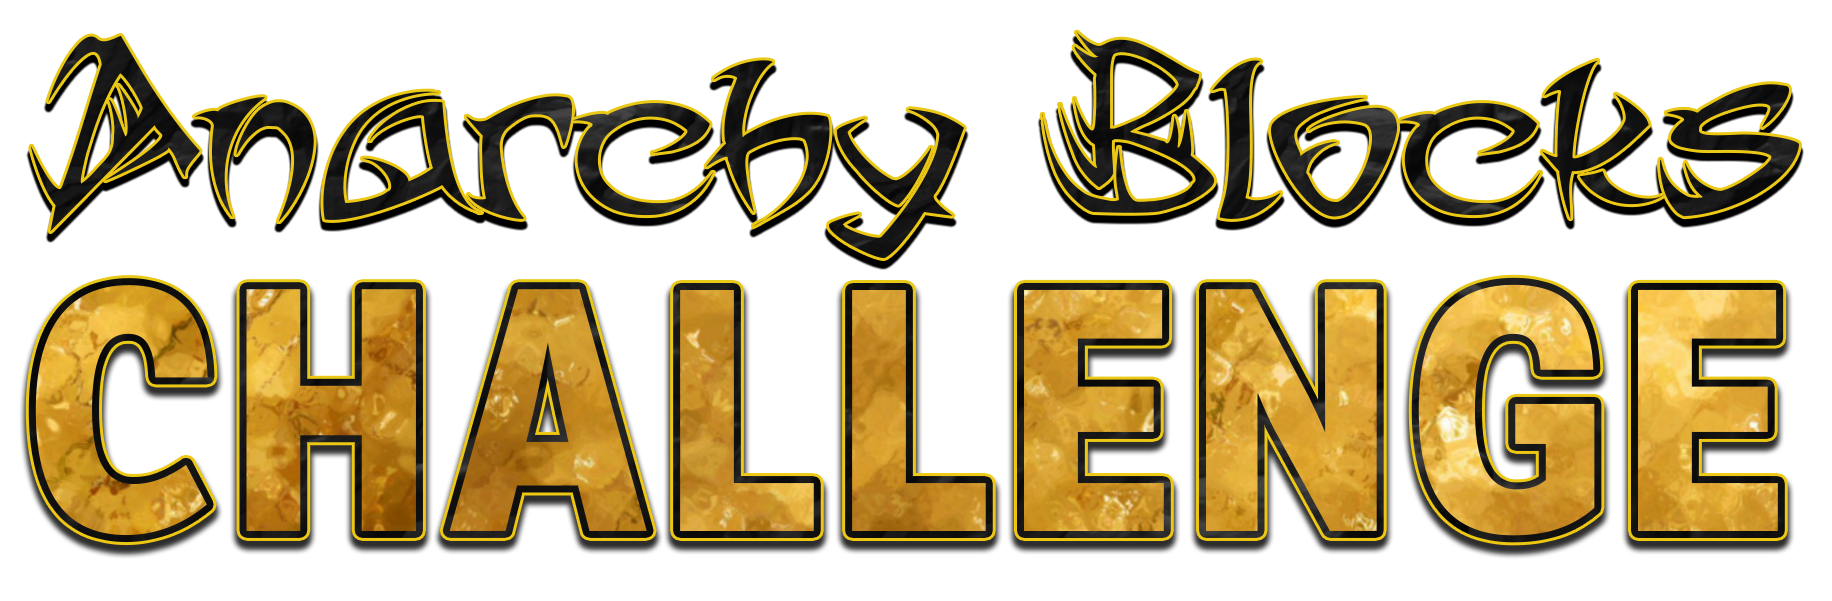 Anarchy Blocks Challenge Logo